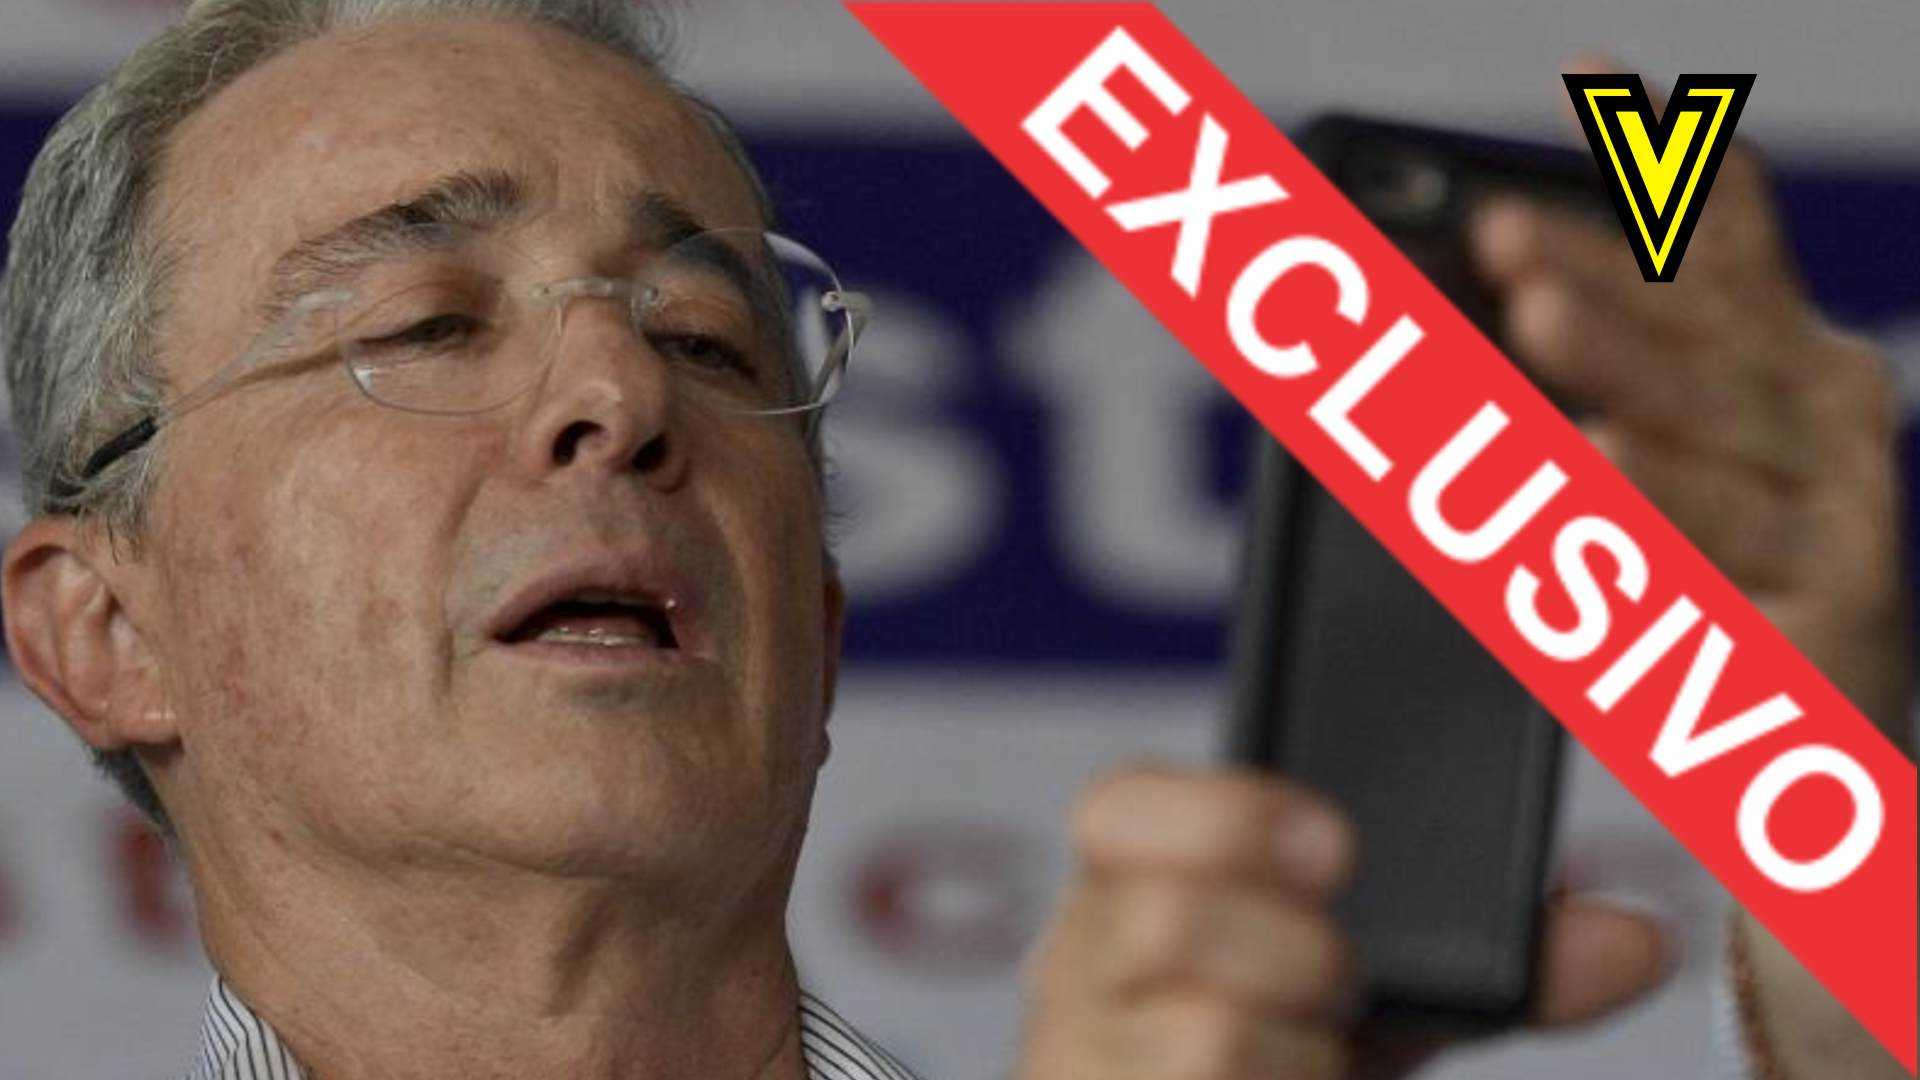 La Verdad Sobre Alvaro Uribe Vélez